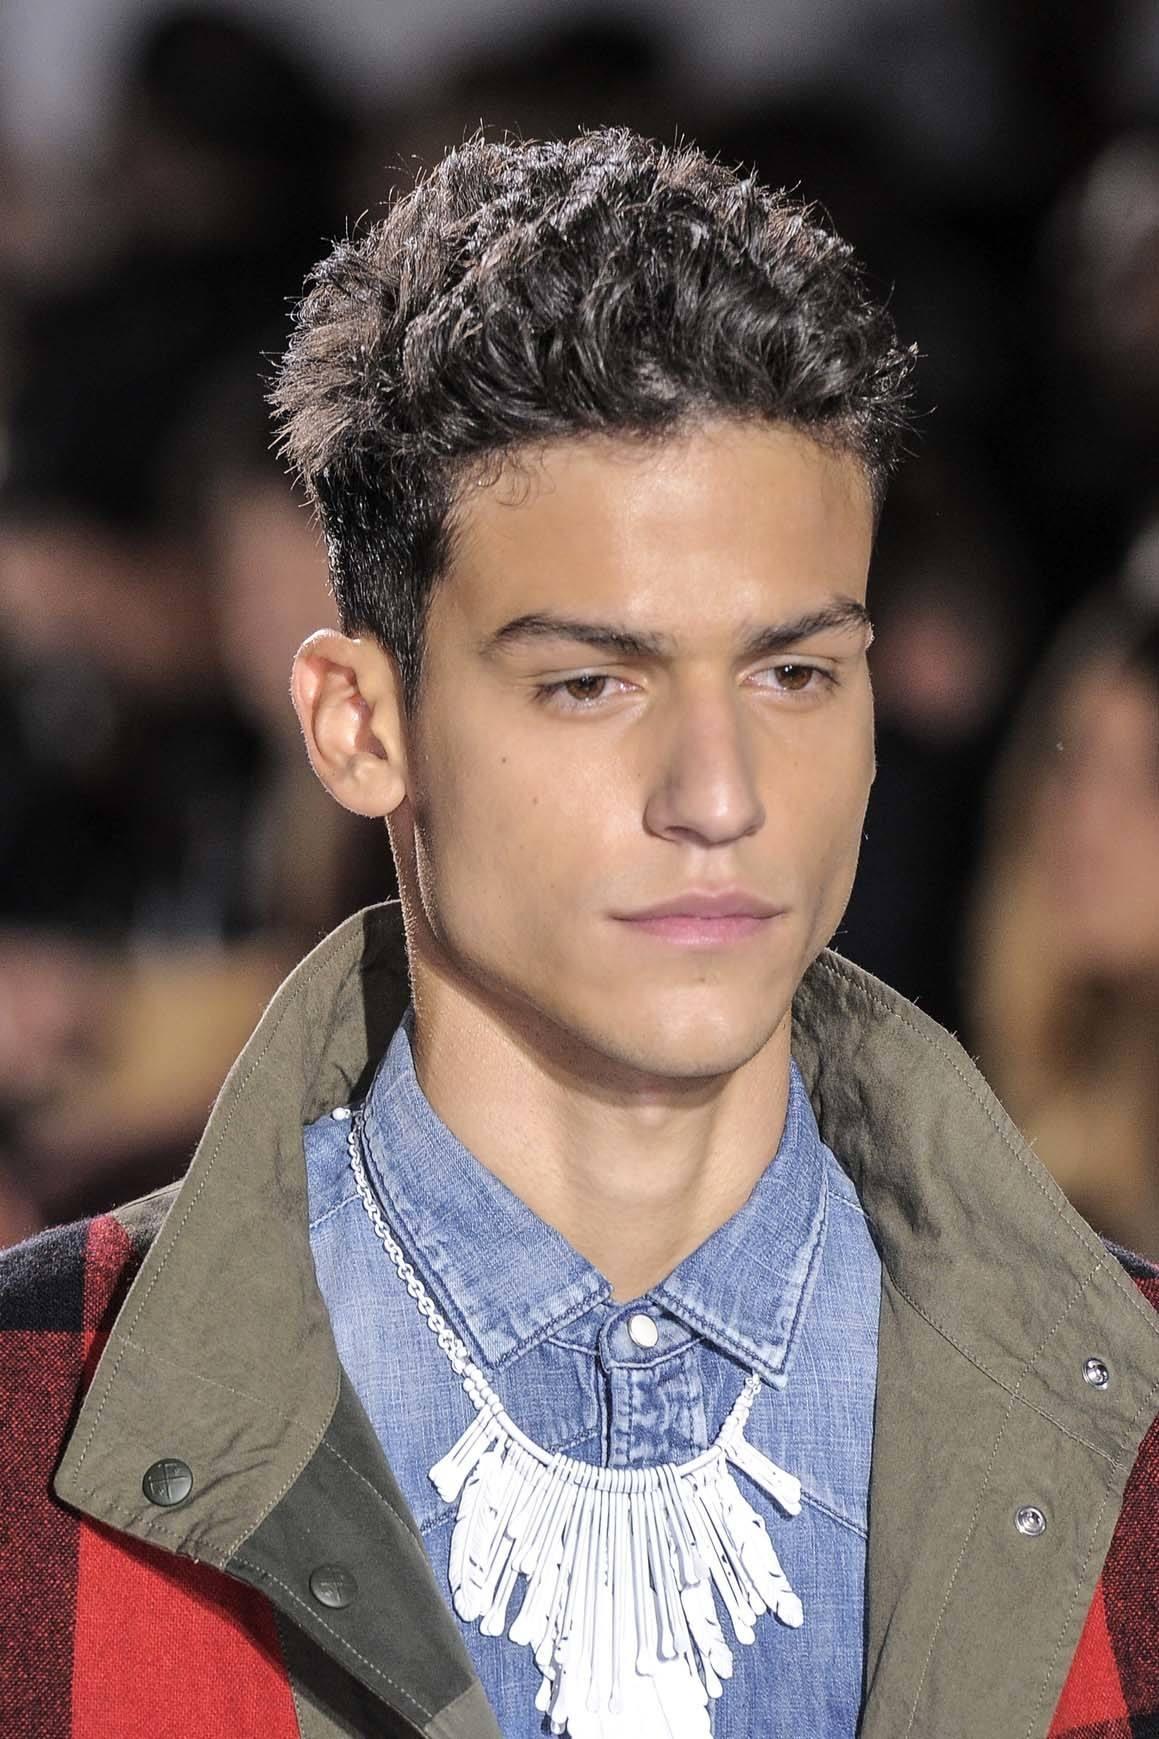 men's undercut hairstyle: tousled undercut